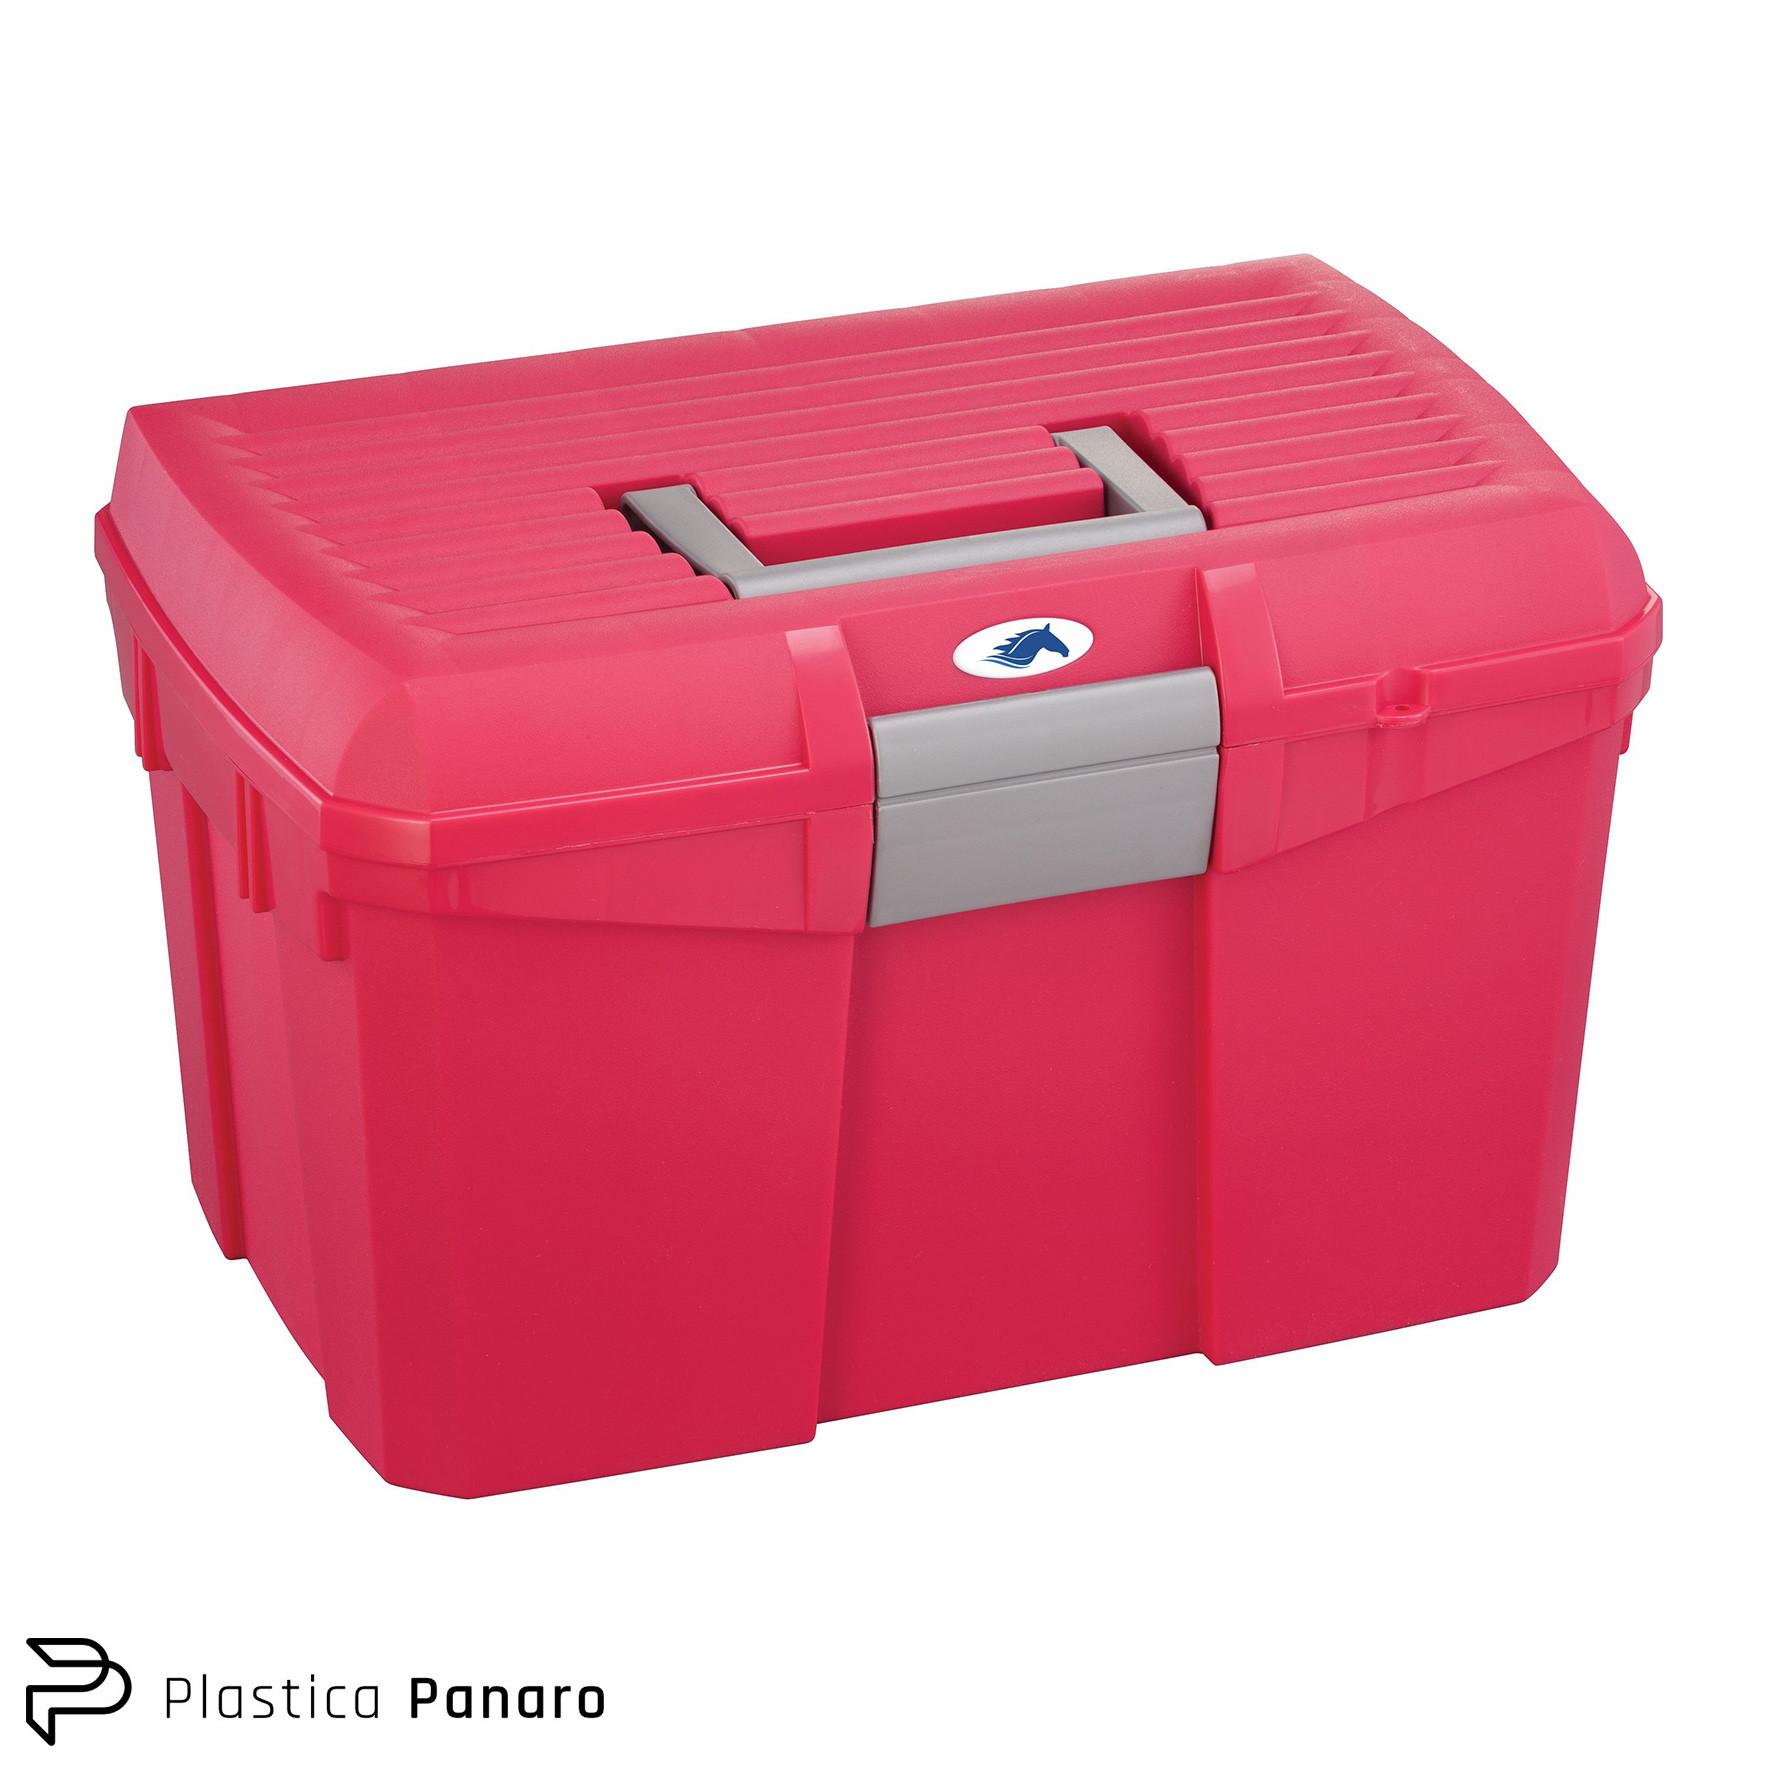 Plastica Panaro Tack Box – Medium – Raspberry/Silver